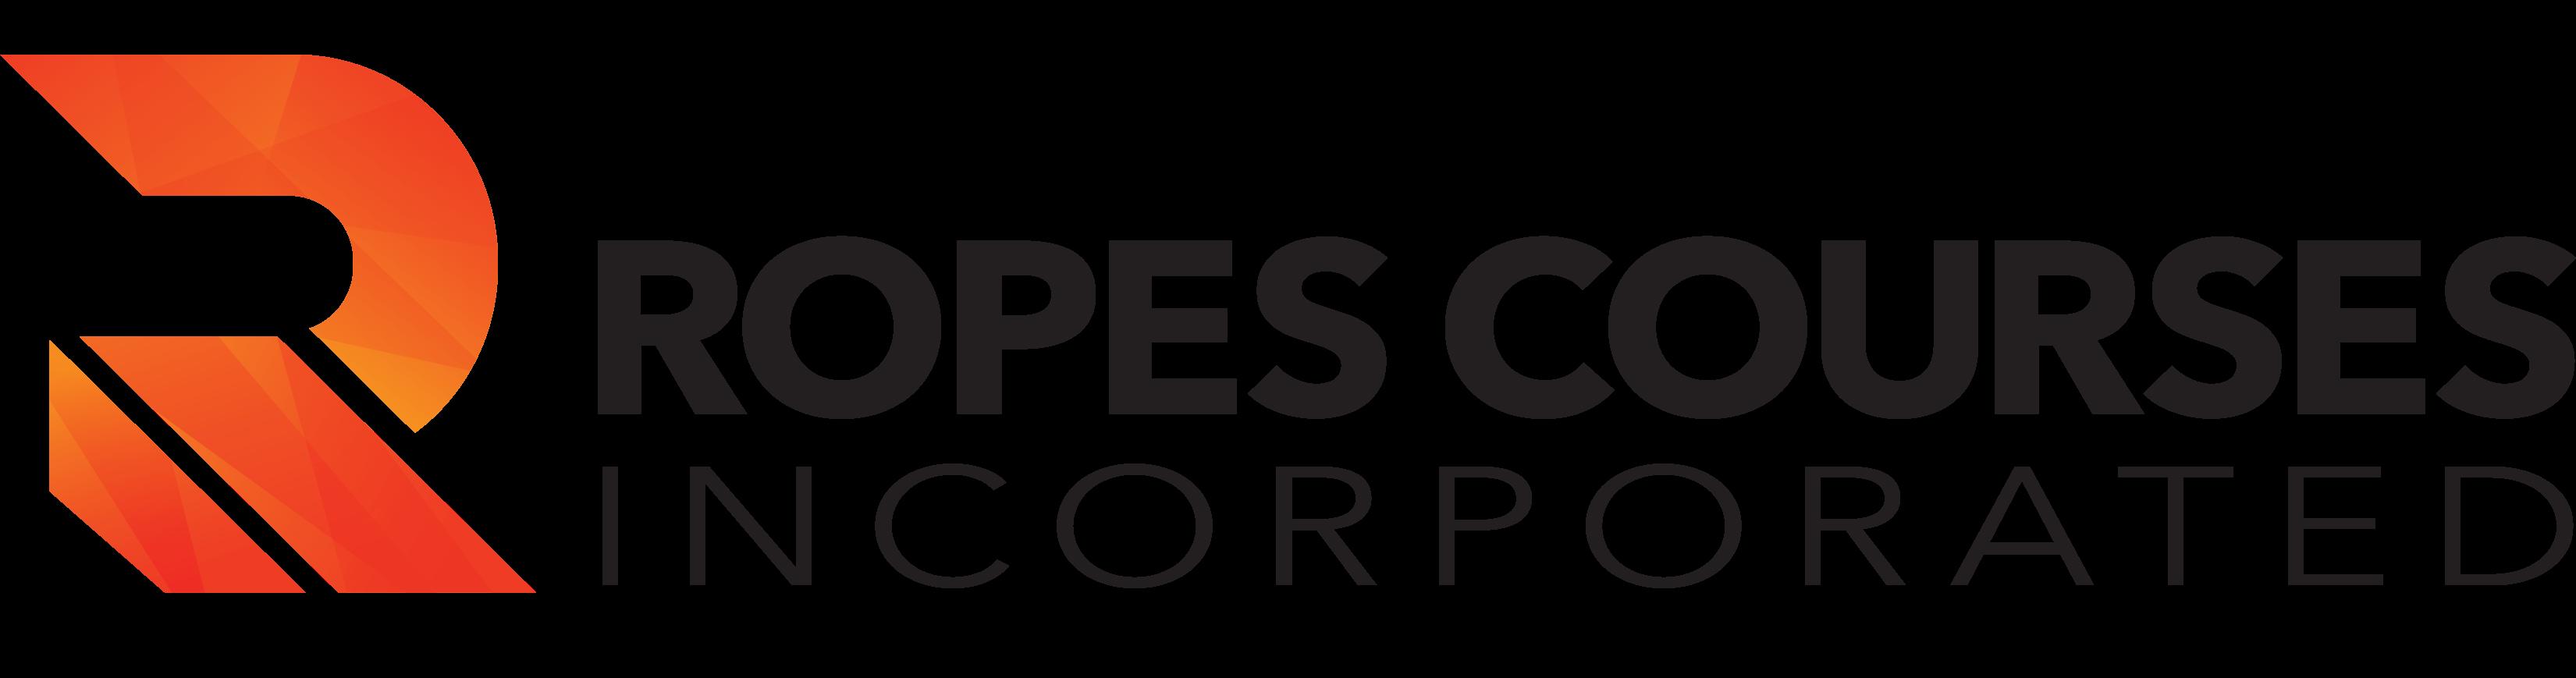 Ropes Courses, Inc. (RCI)